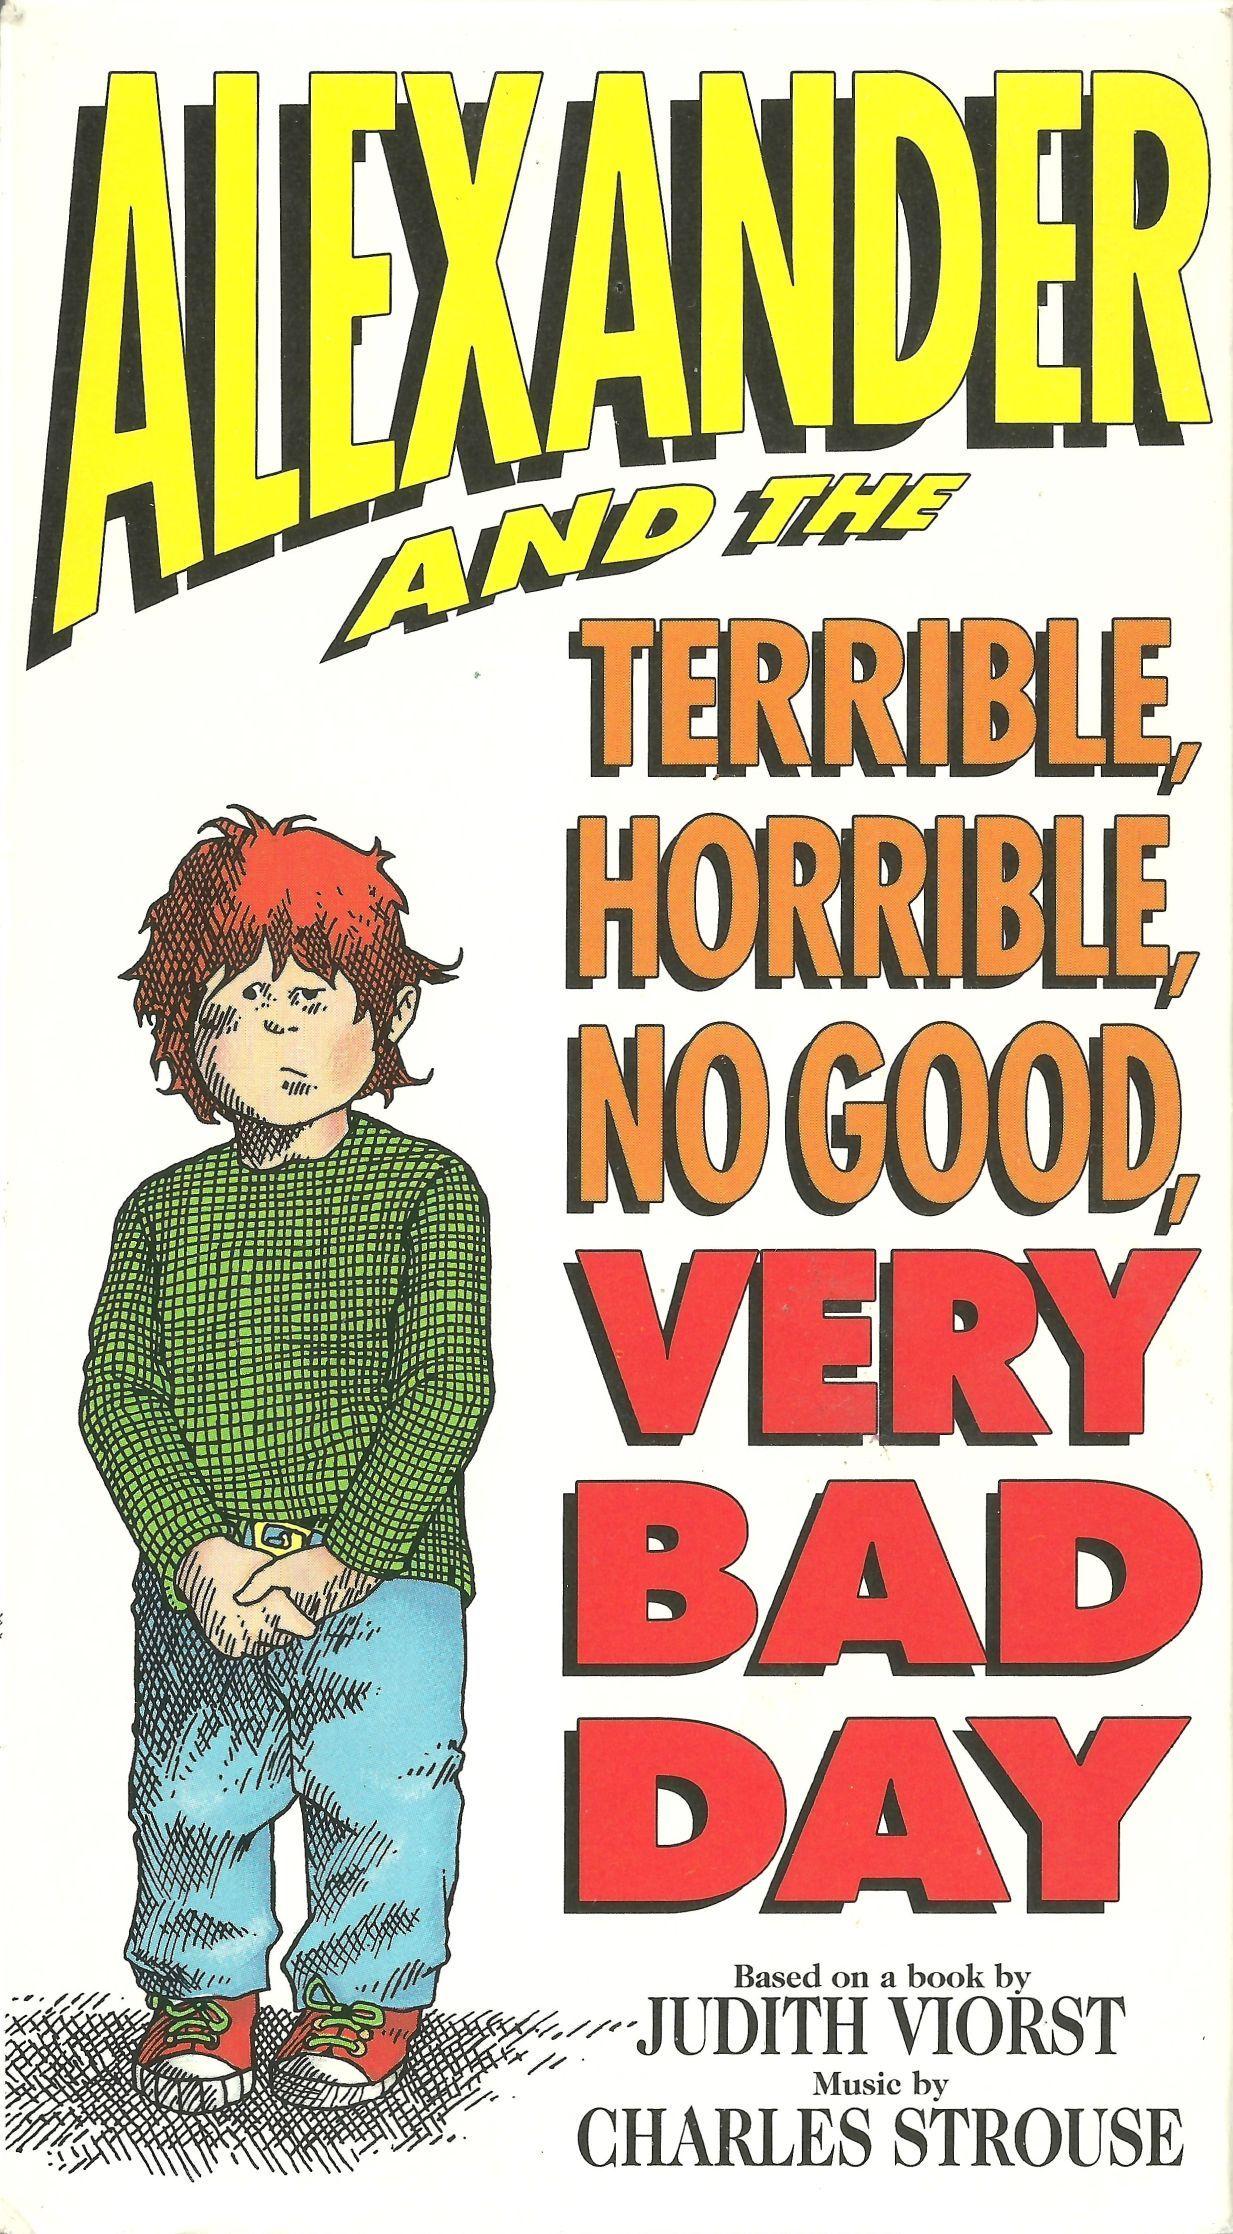 Alexander and the Terrible Horrible No Good Very Bad Day (1990) Credits 2